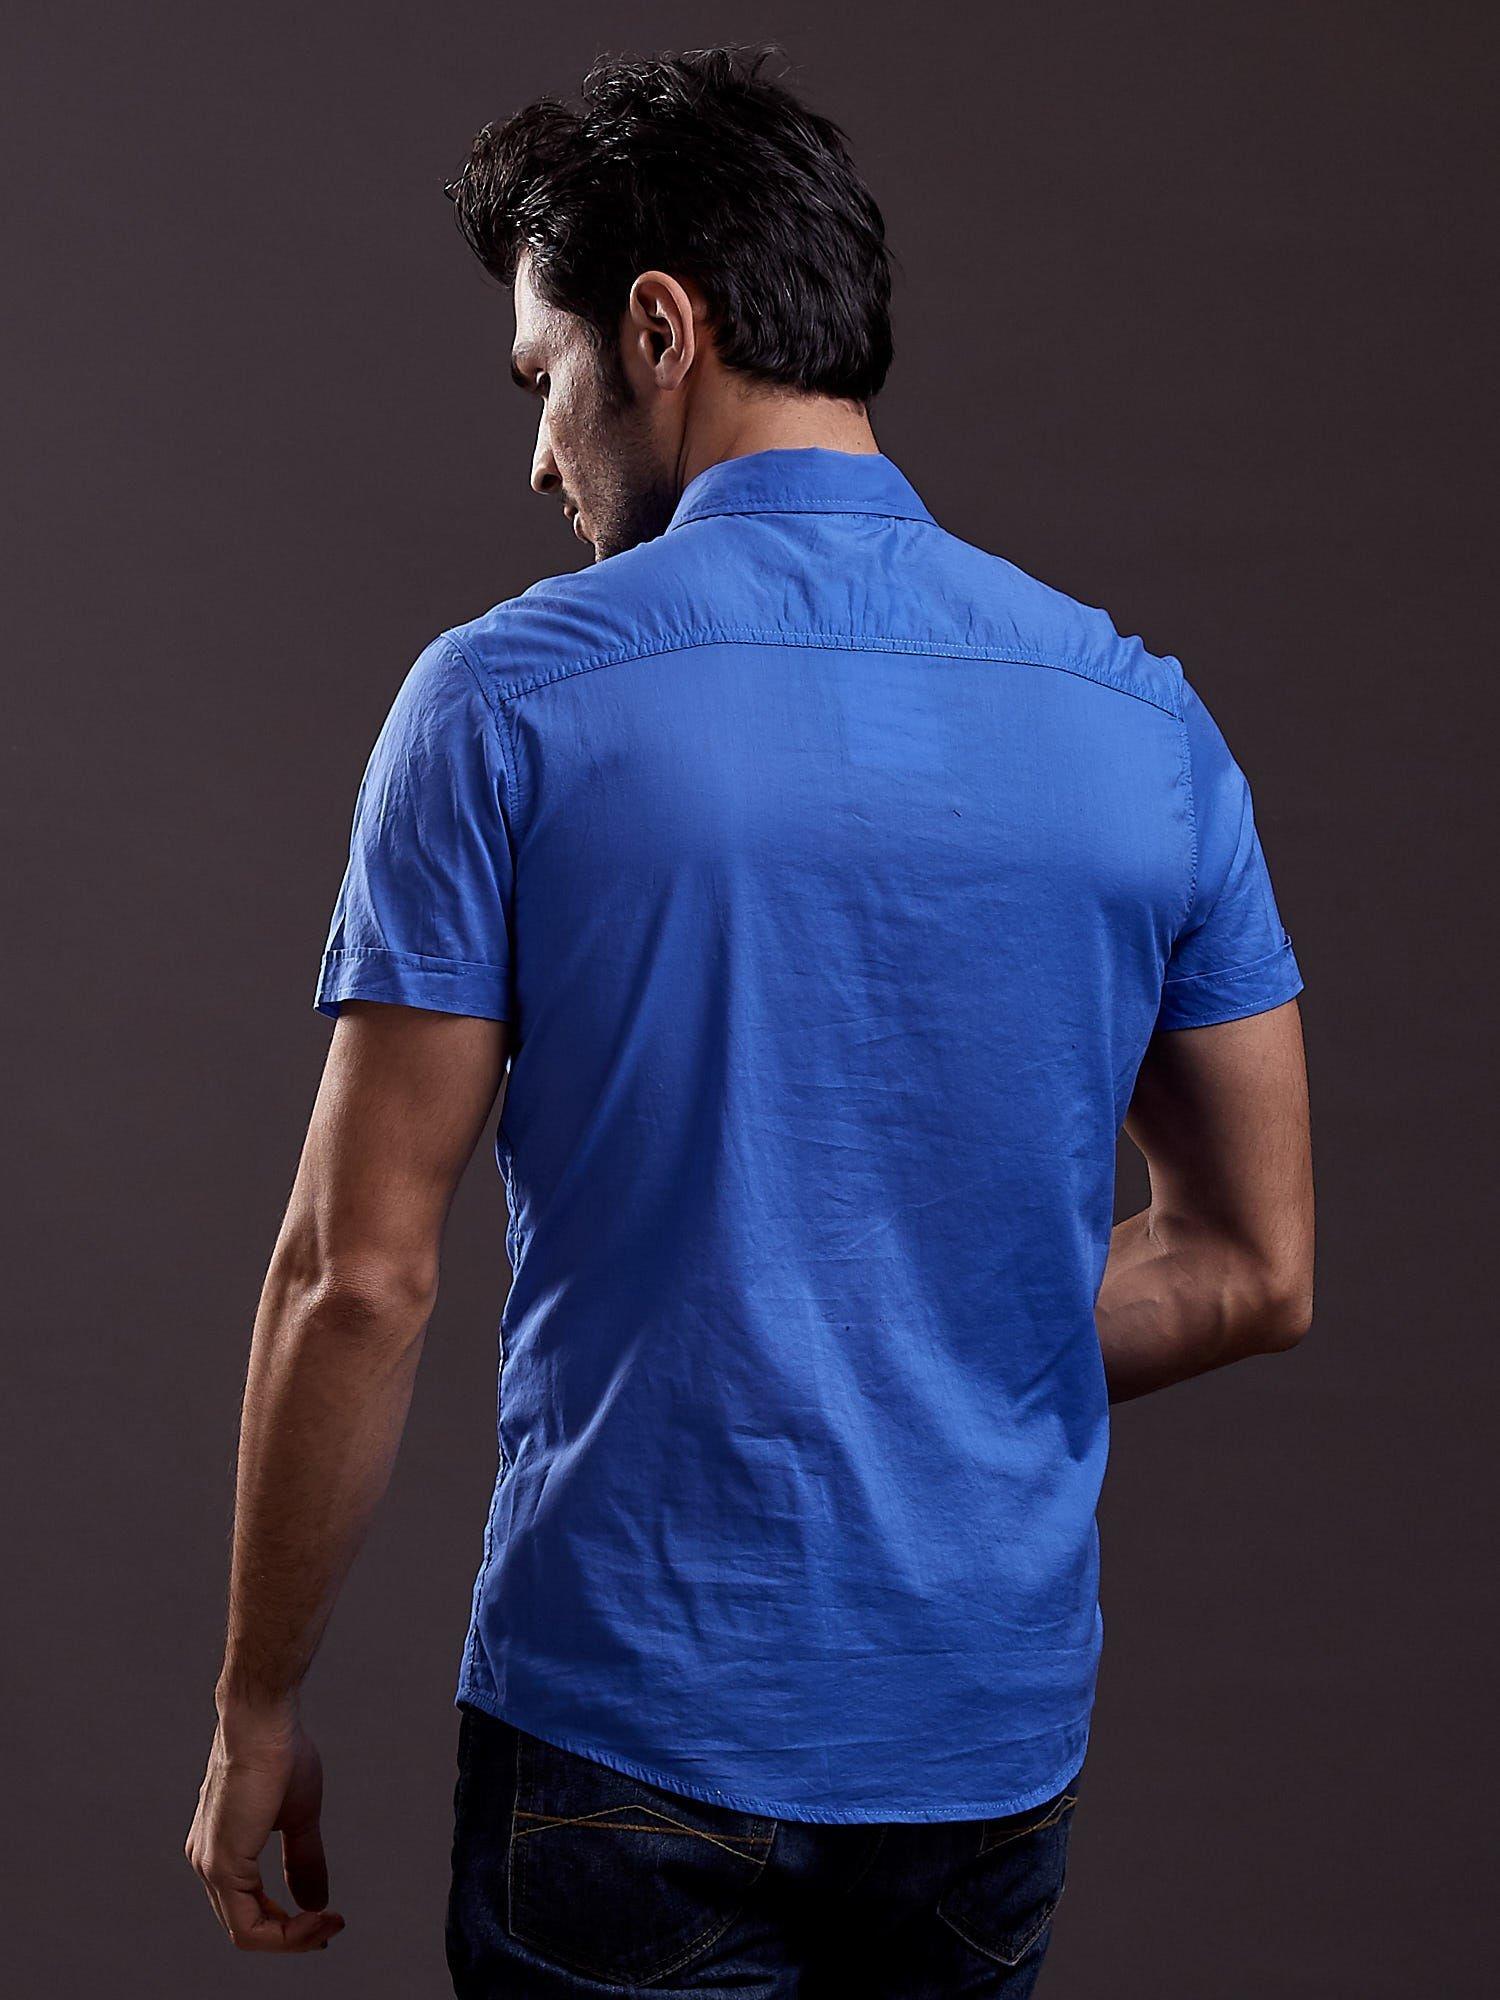 Niebieska gładka koszula męska Funk n Soul                                  zdj.                                  4